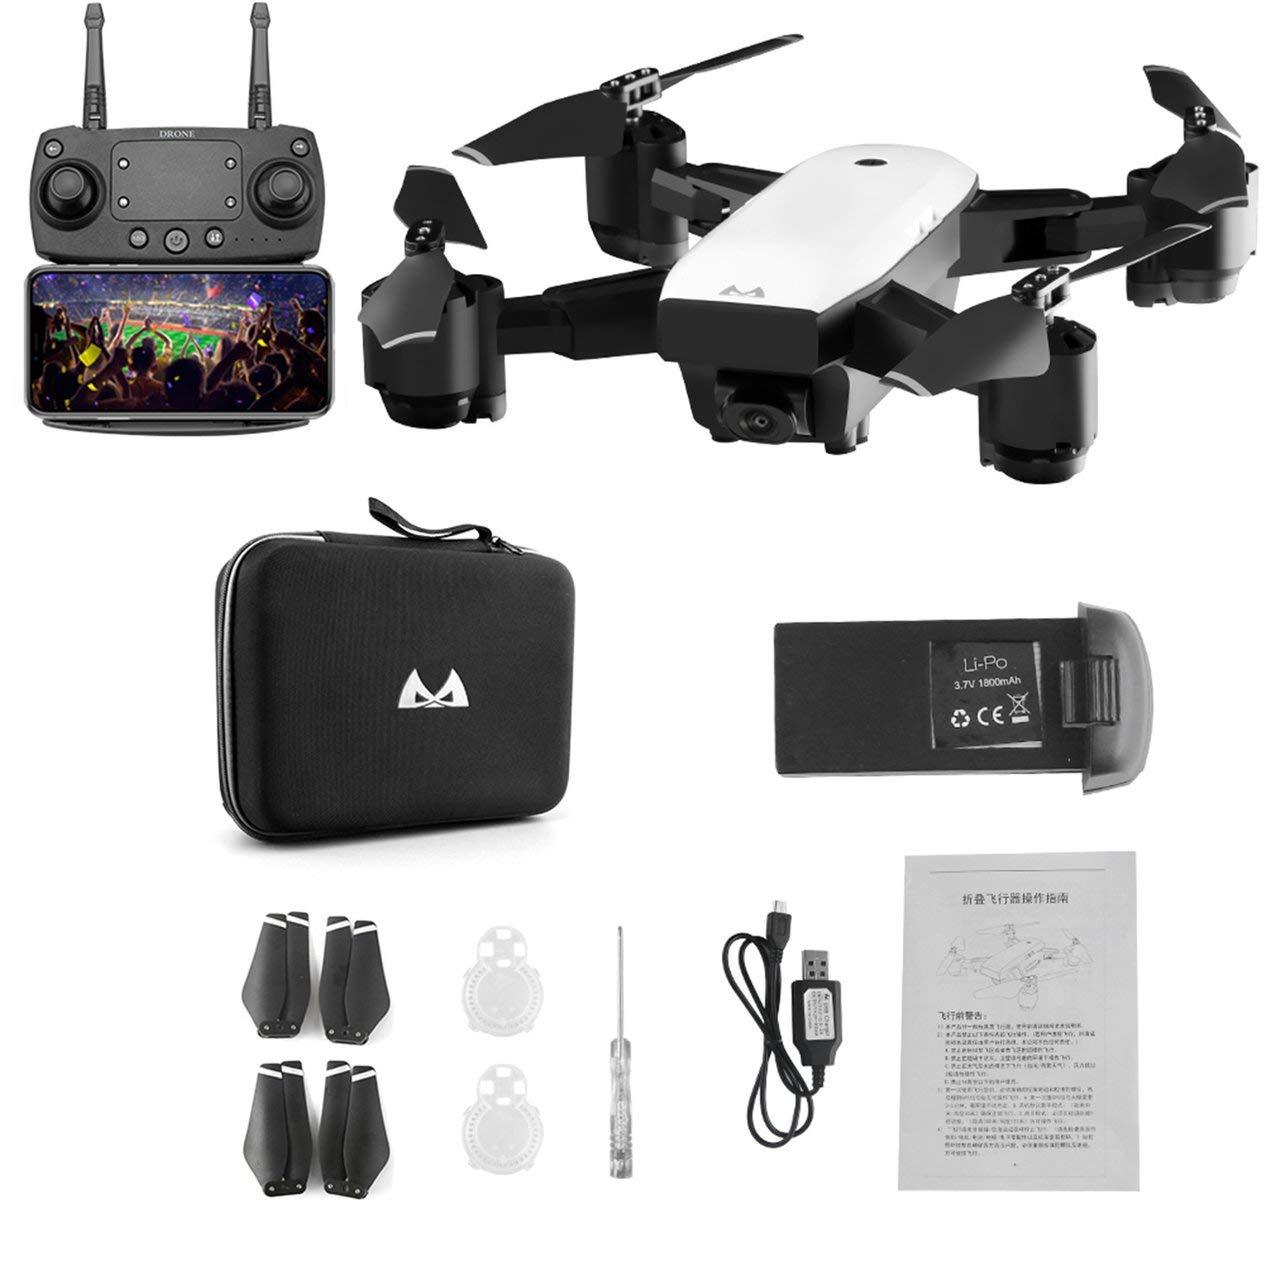 a la venta EdBerk74 SMRC S20 6 Ejes Gyro Gyro Gyro Mini GPS Drone con Gran Angular 1080P Cámara 2.4G Altitud Hold RC Quadcopter Modelo RC portátil  barato